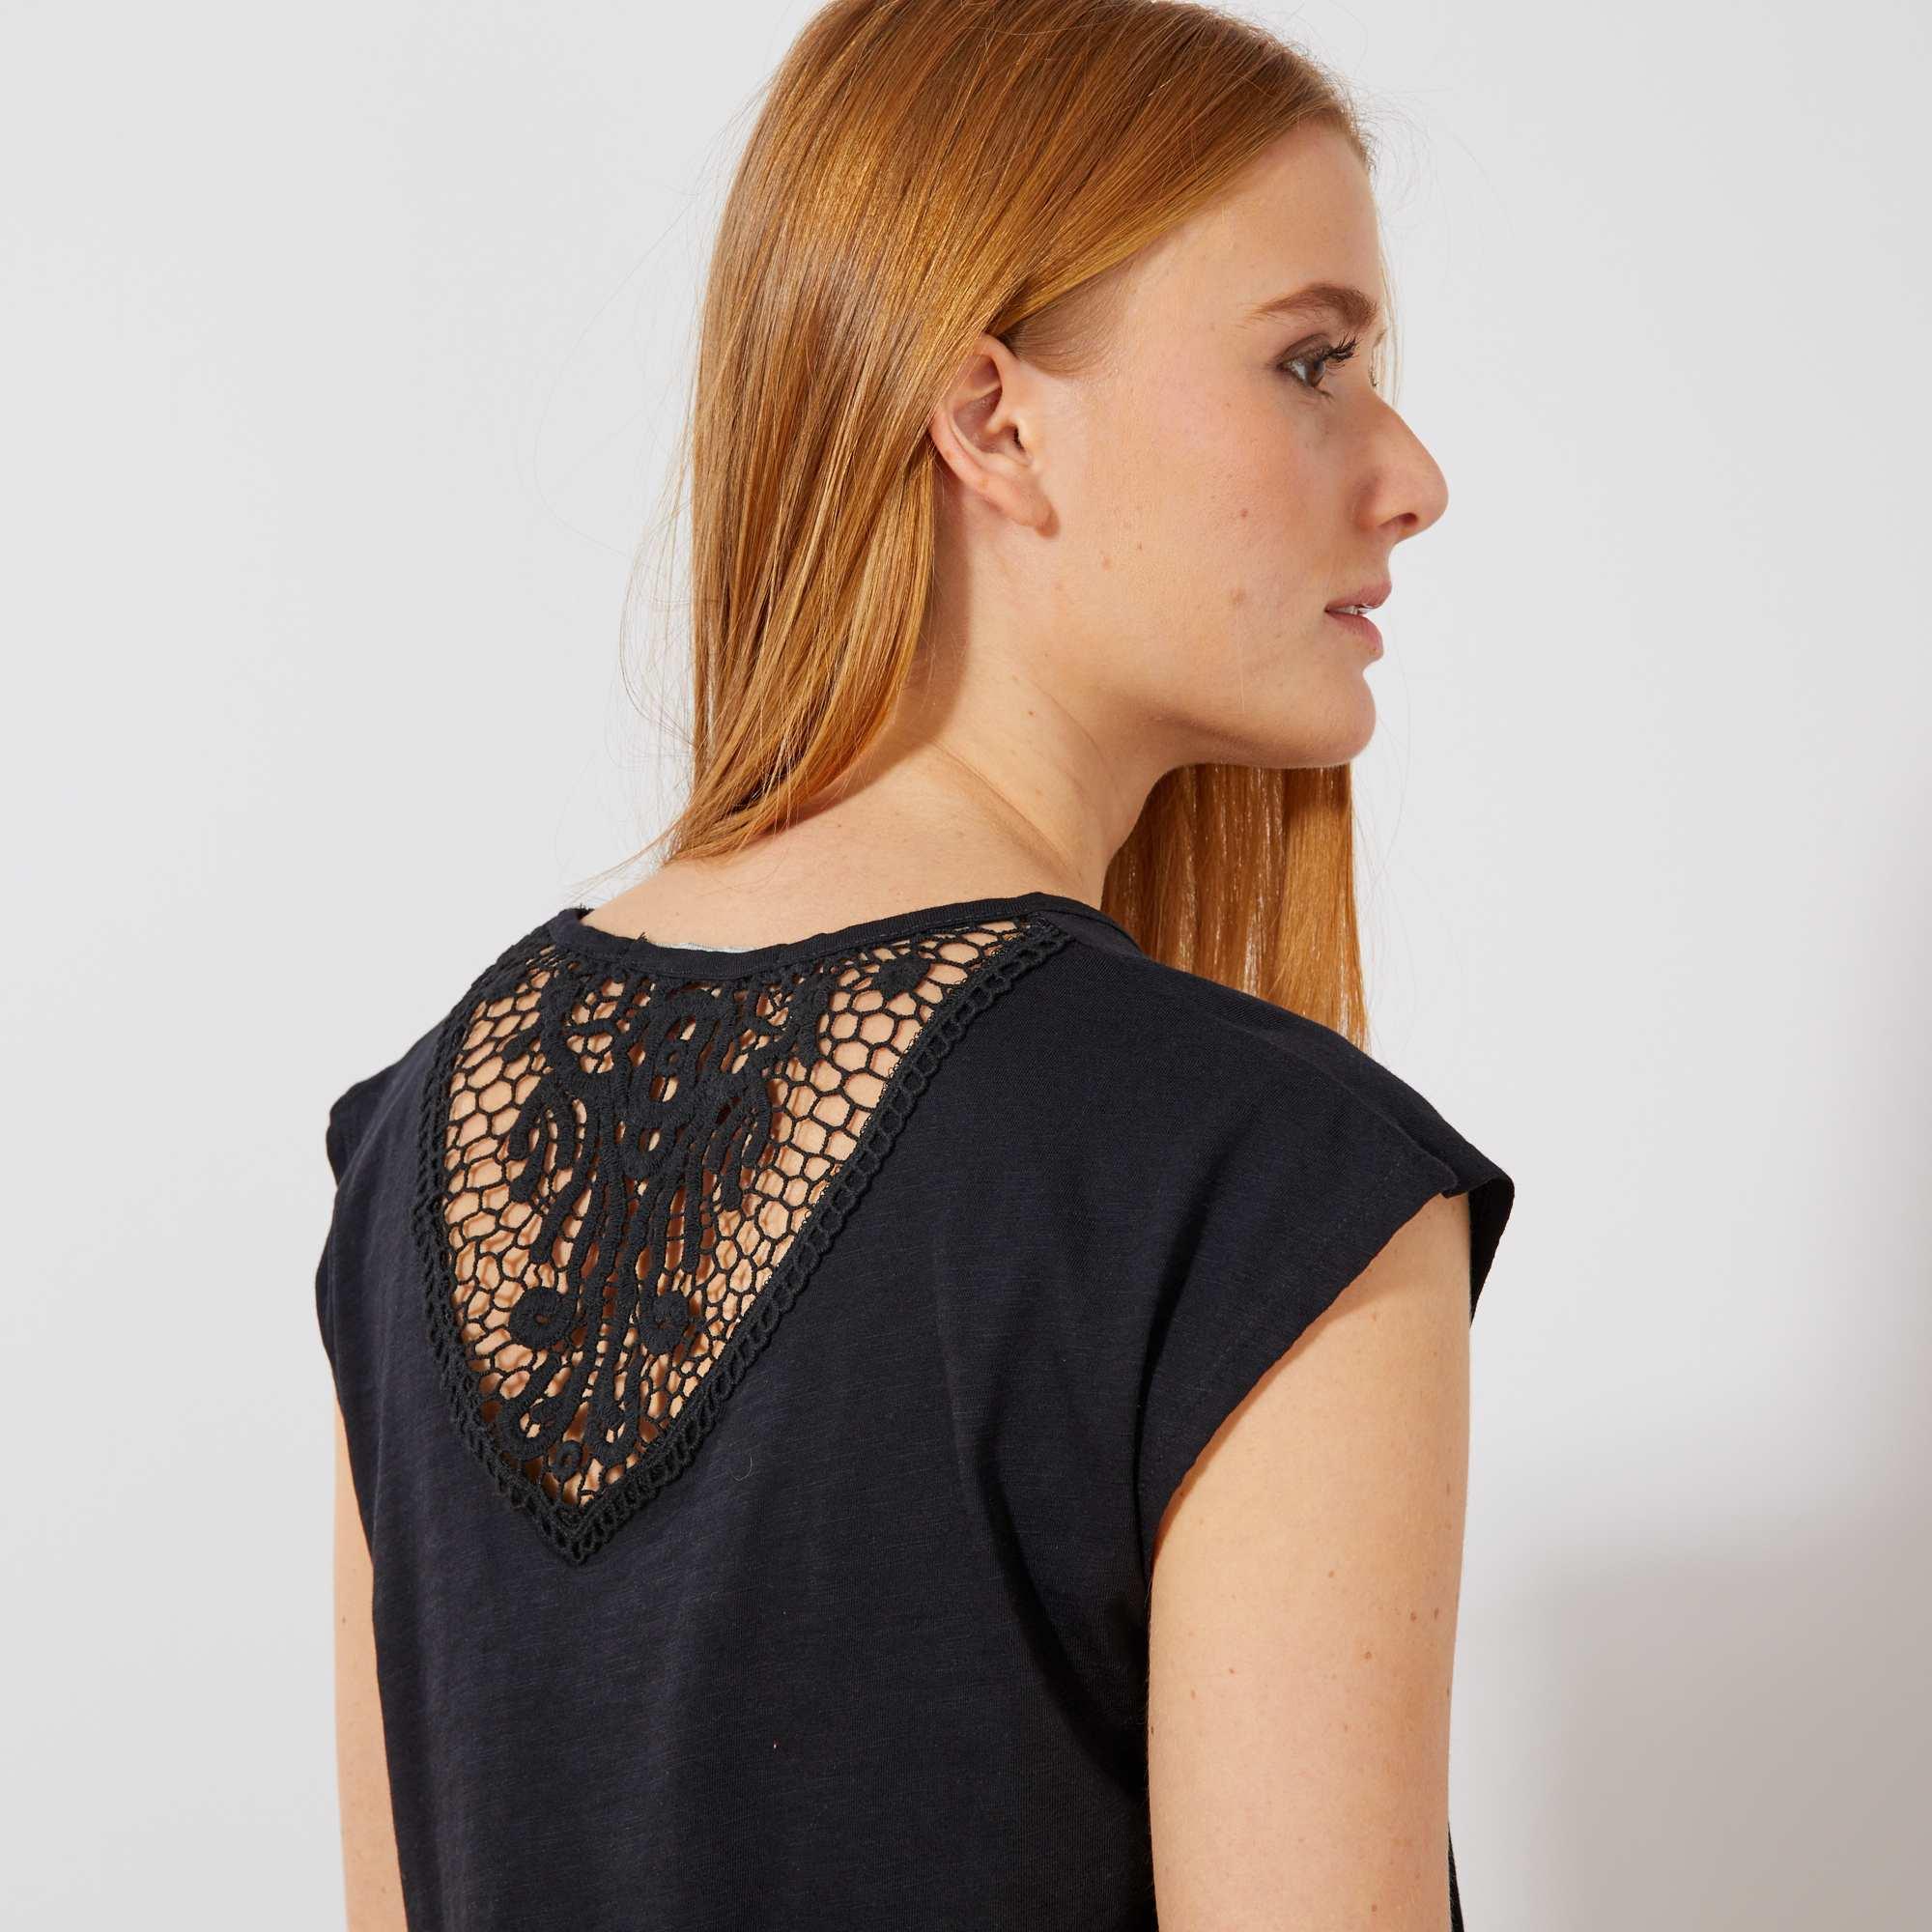 fbb51fb23e69a5 Soepele jurk met macramé op de rug Dameskleding - zwart - Kiabi - 20